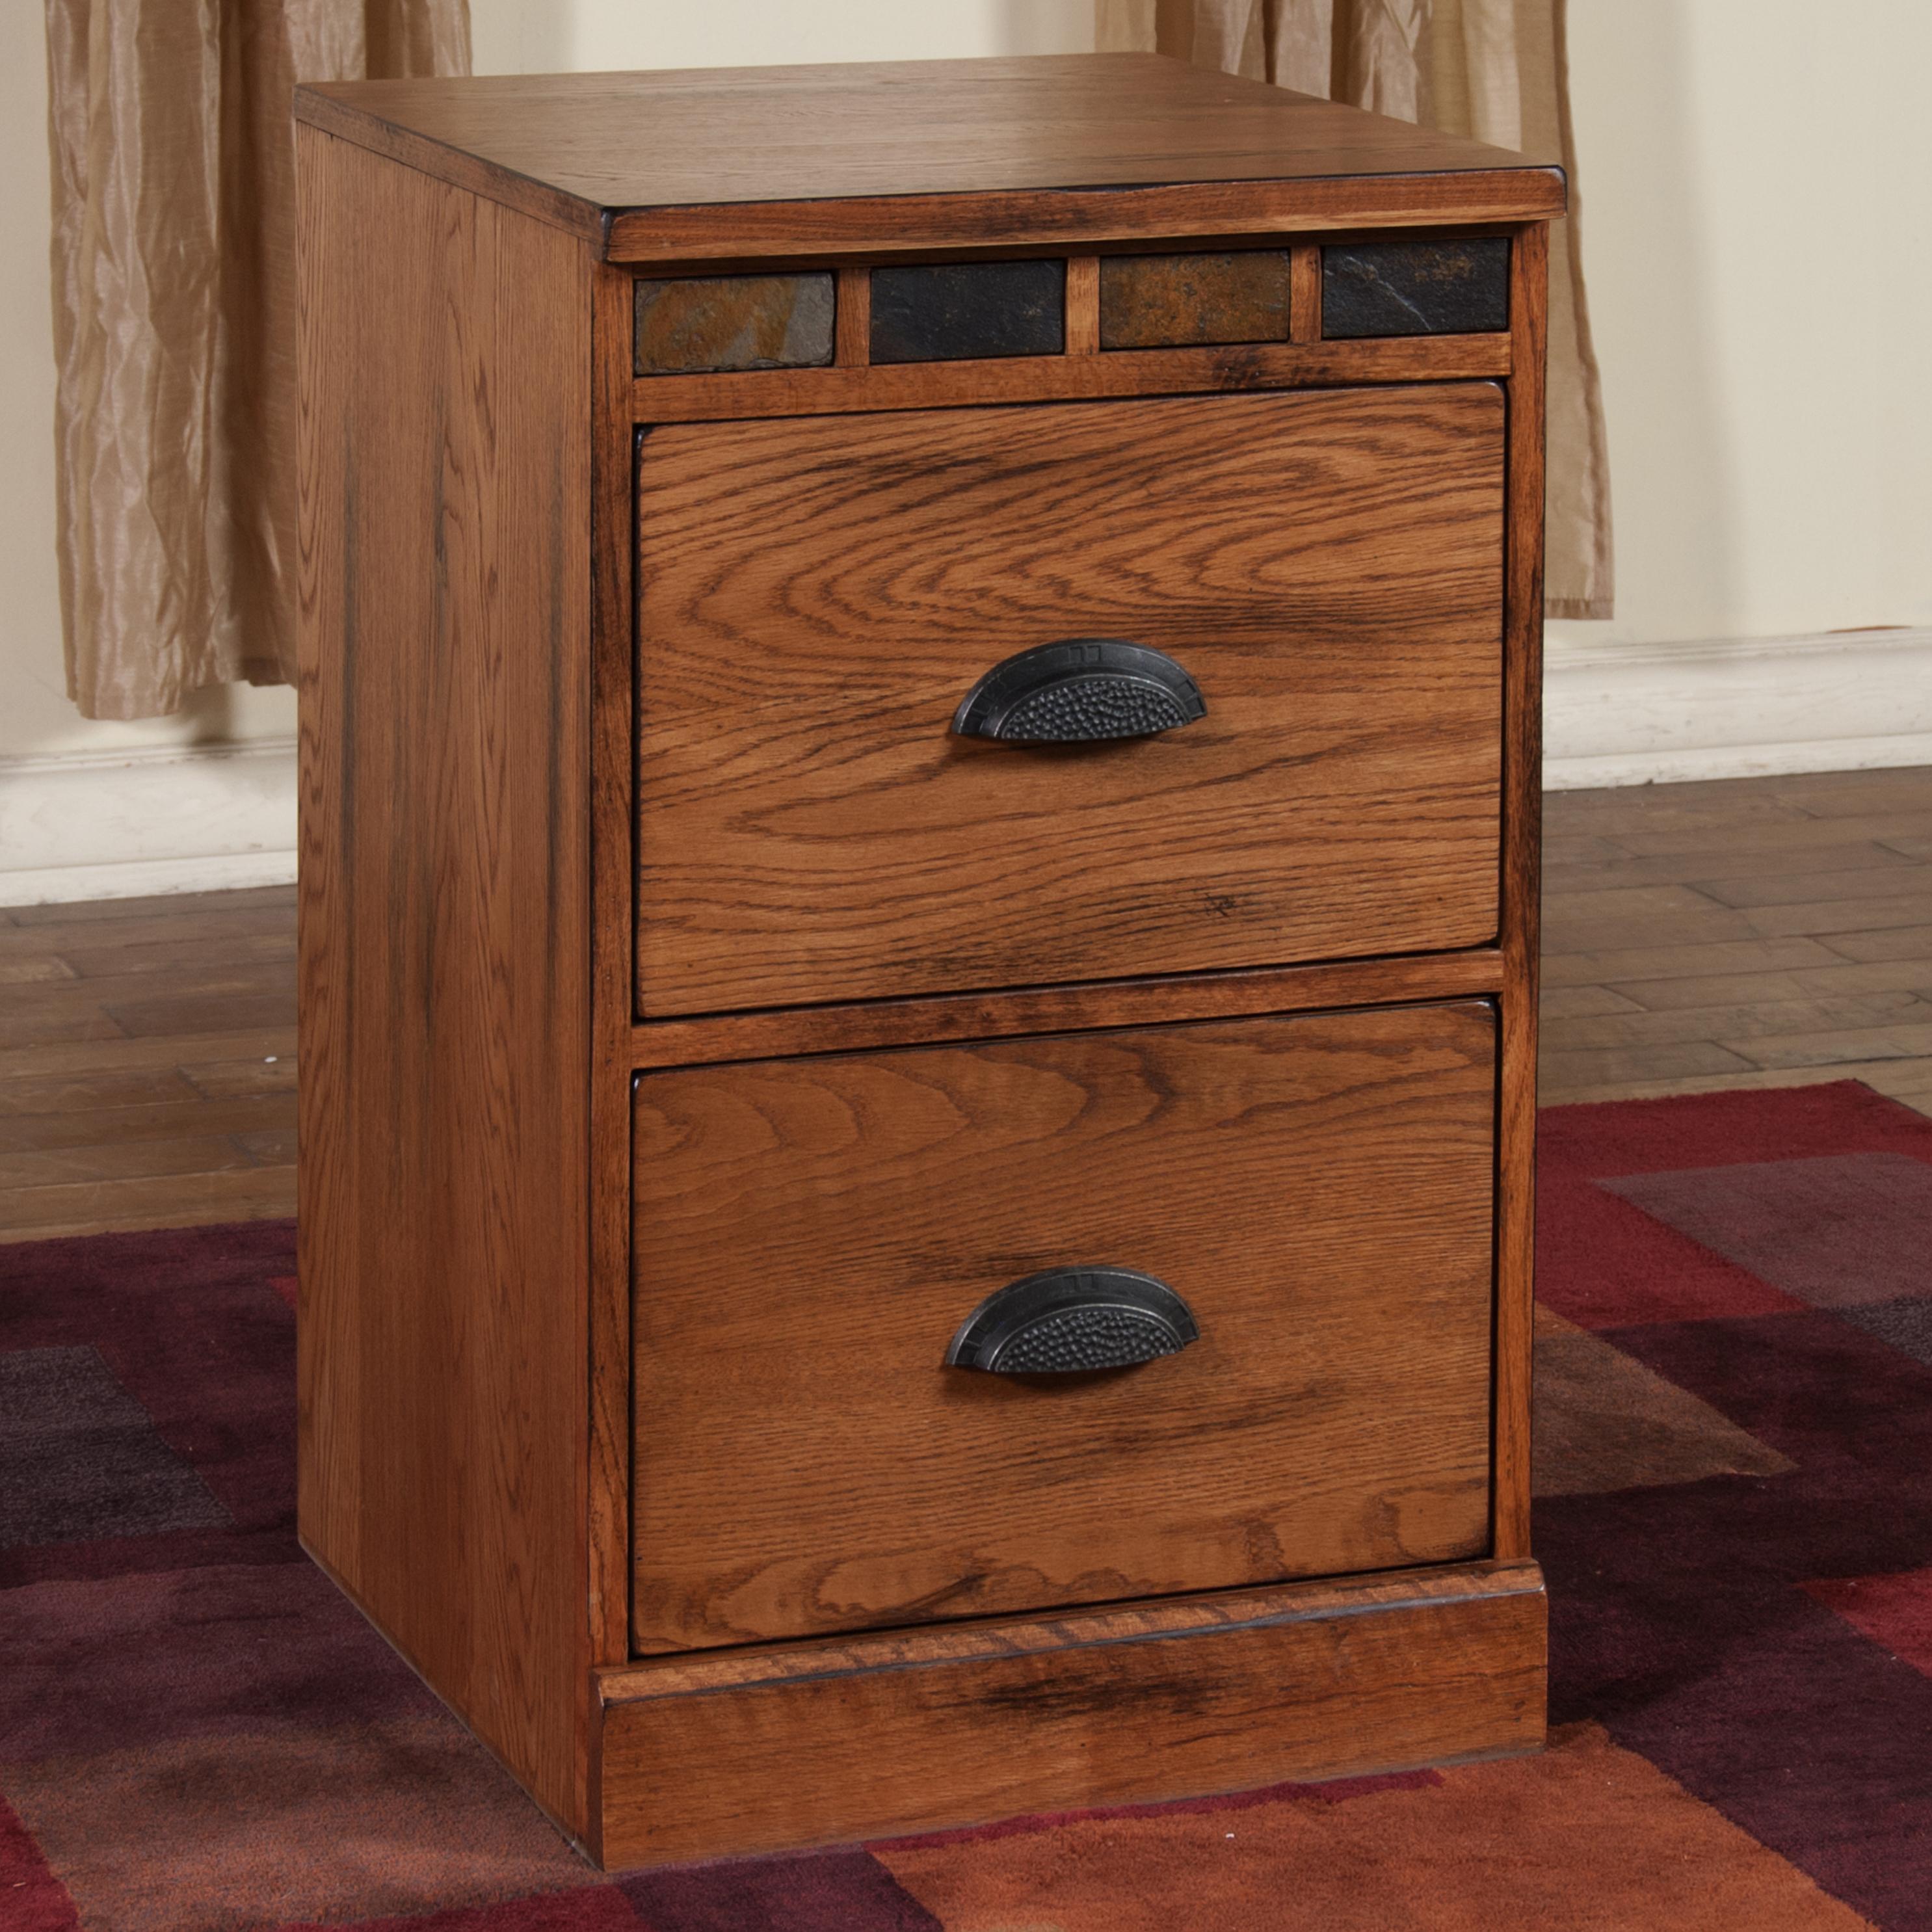 Market Square Morris HomeWaco File Cabinet